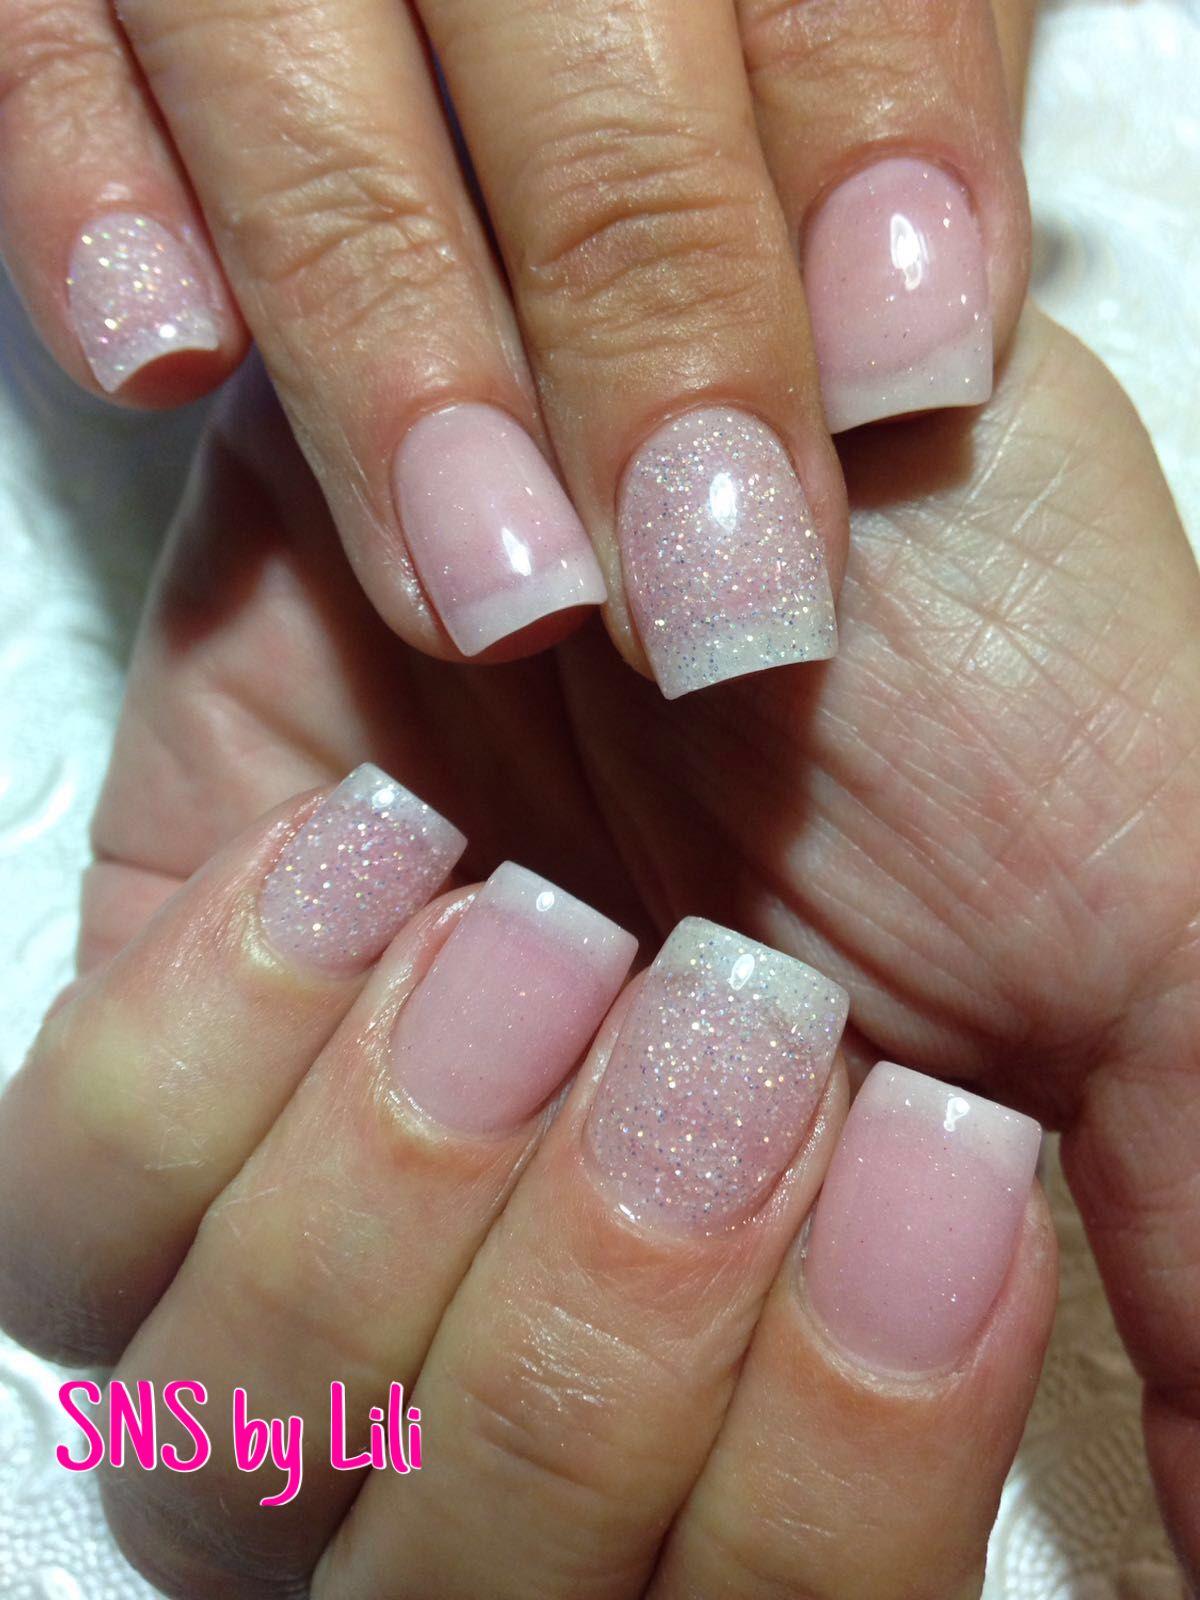 SNS nails (dipping powder) by Lili ! - Nails | Pinterest - Nagel ...